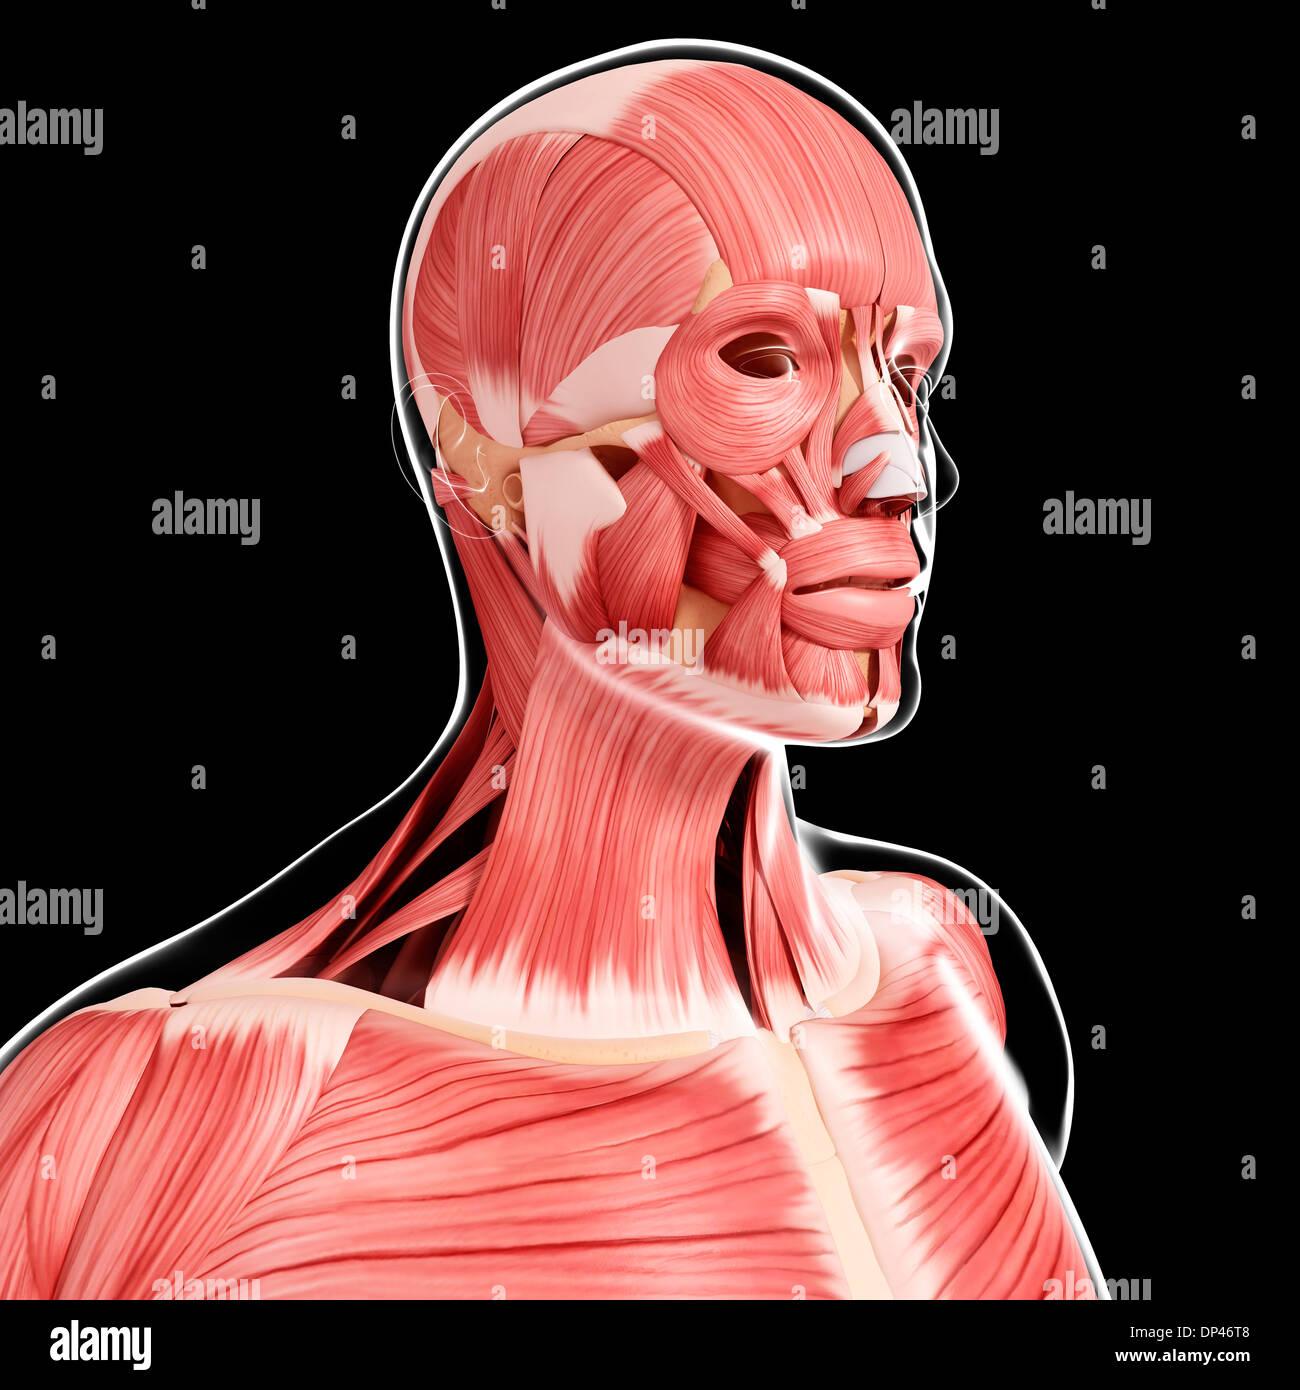 Human musculature, artwork Stock Photo